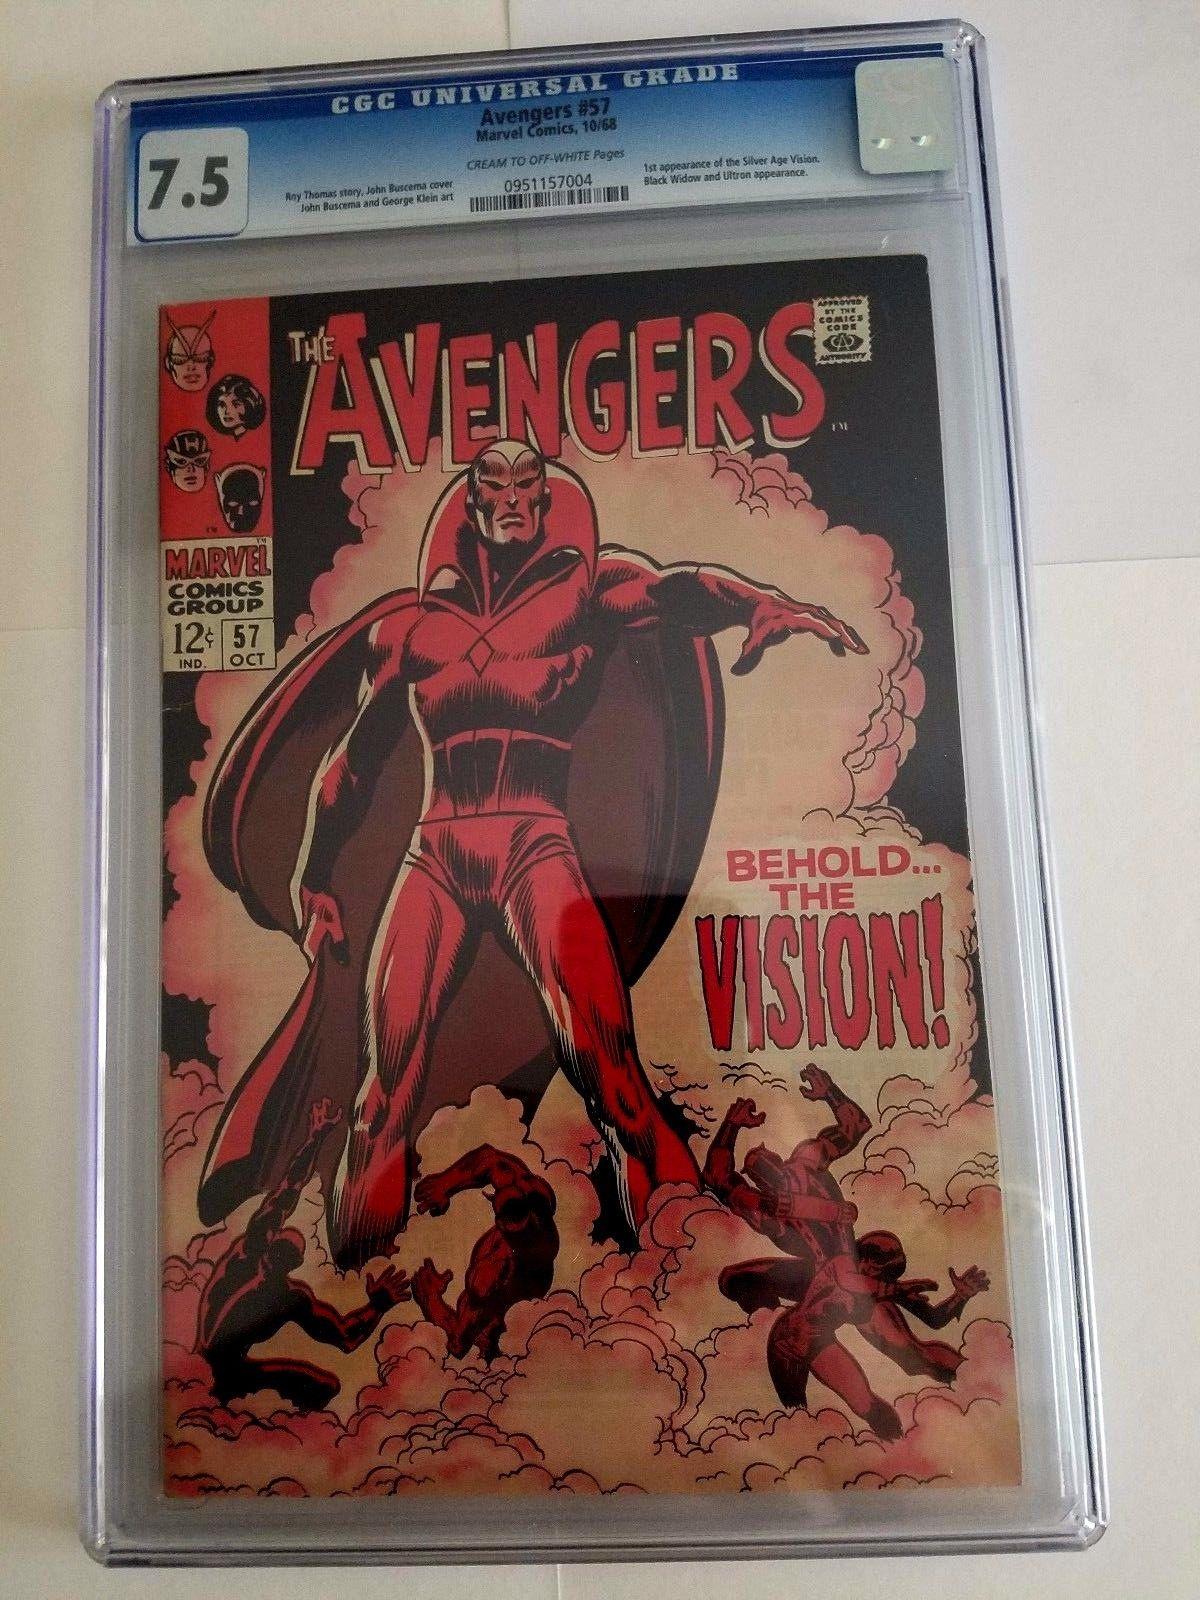 Marvel Comics Avengers #57 CGC graded 7.5